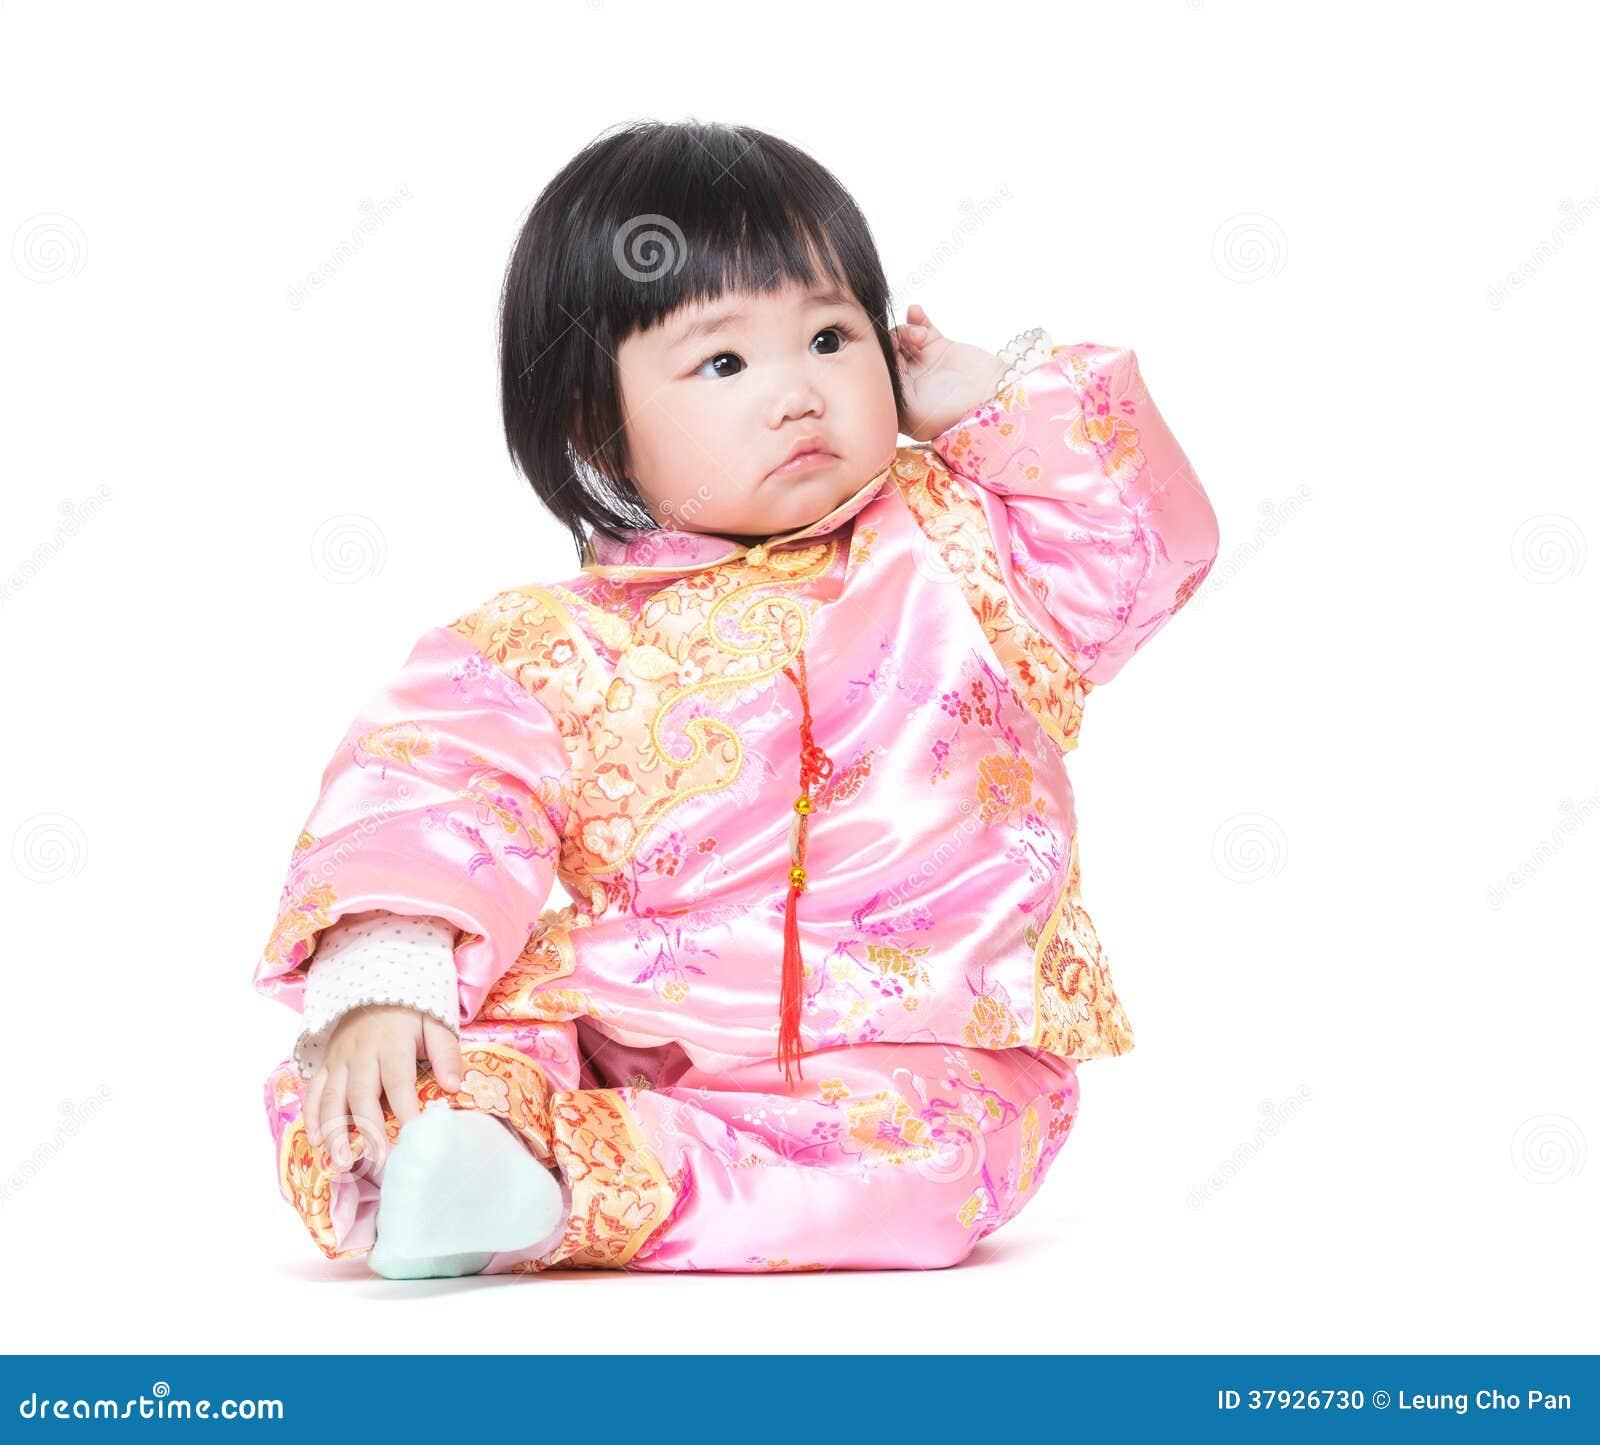 Het Chinese krassende haar van het babymeisje